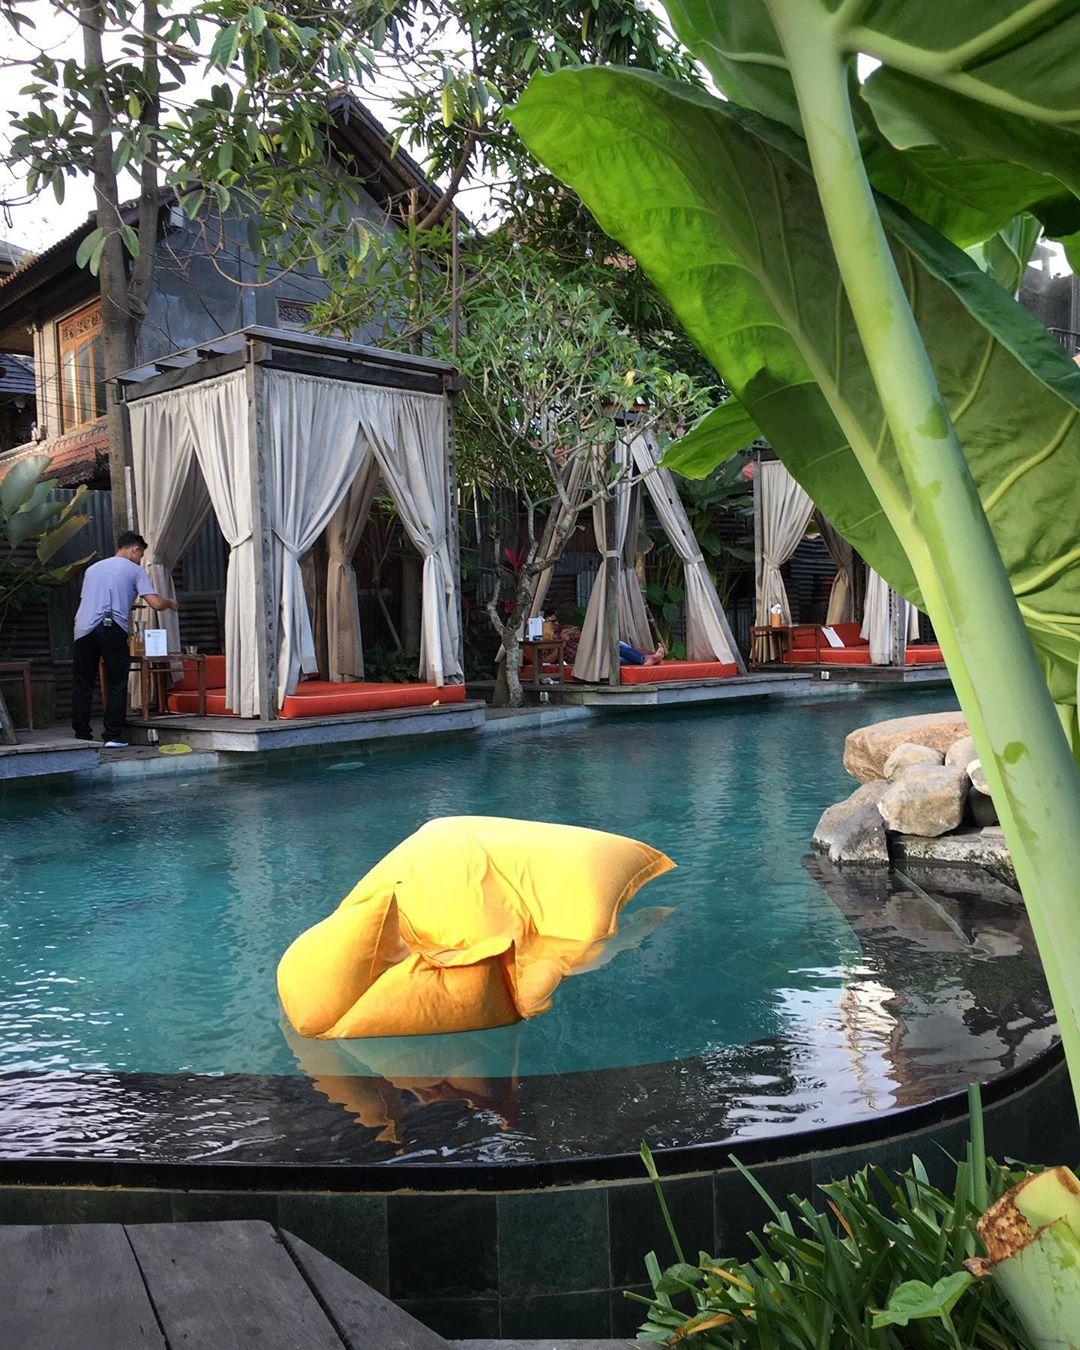 kolam-renang-di-bali-folk-ubud-and-garden